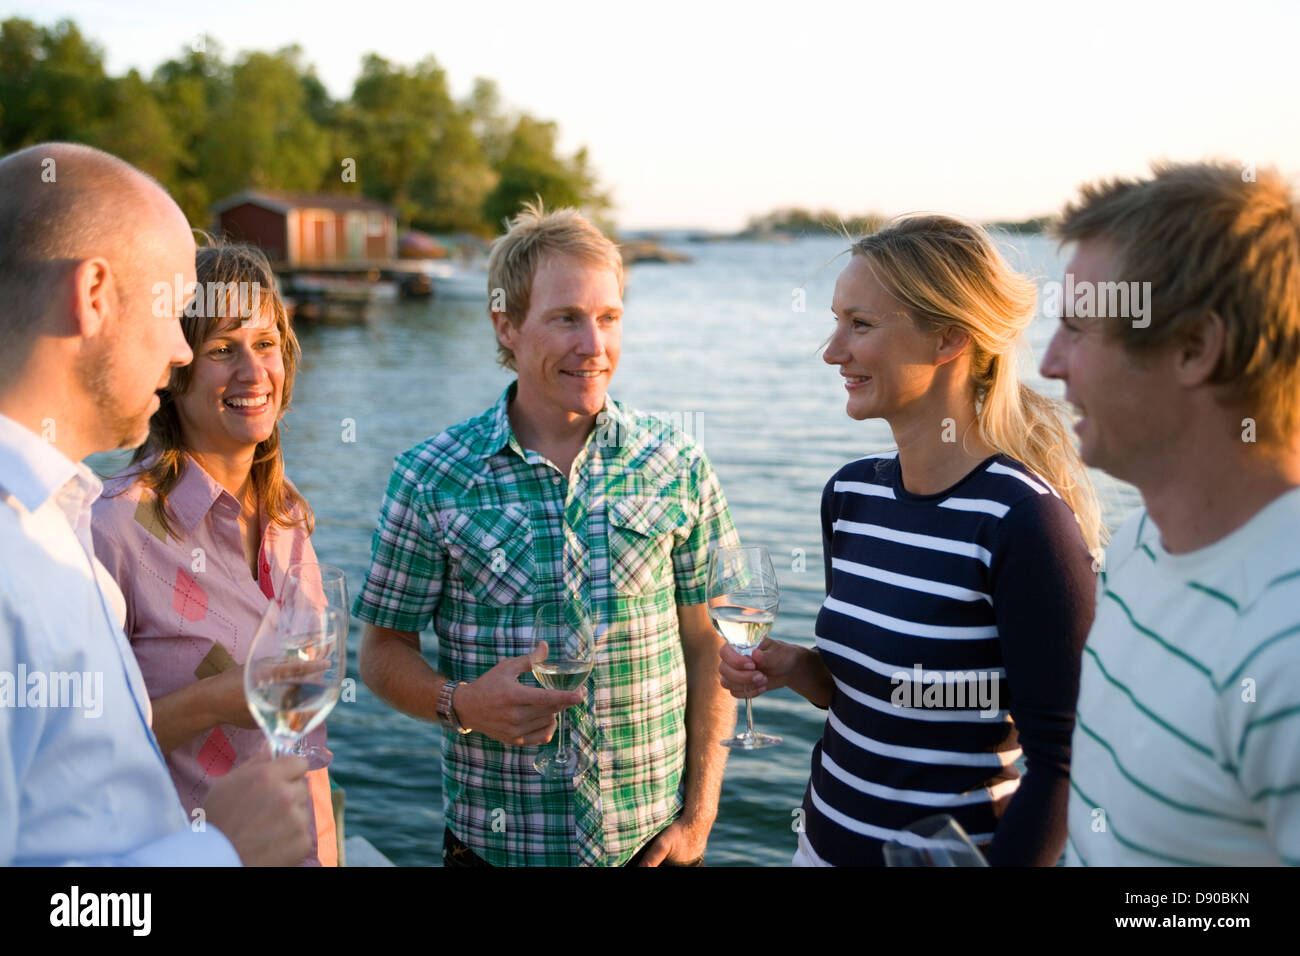 Five friends talking and drinking, Fejan, Stockholm archipelago, Sweden. Stock Photo